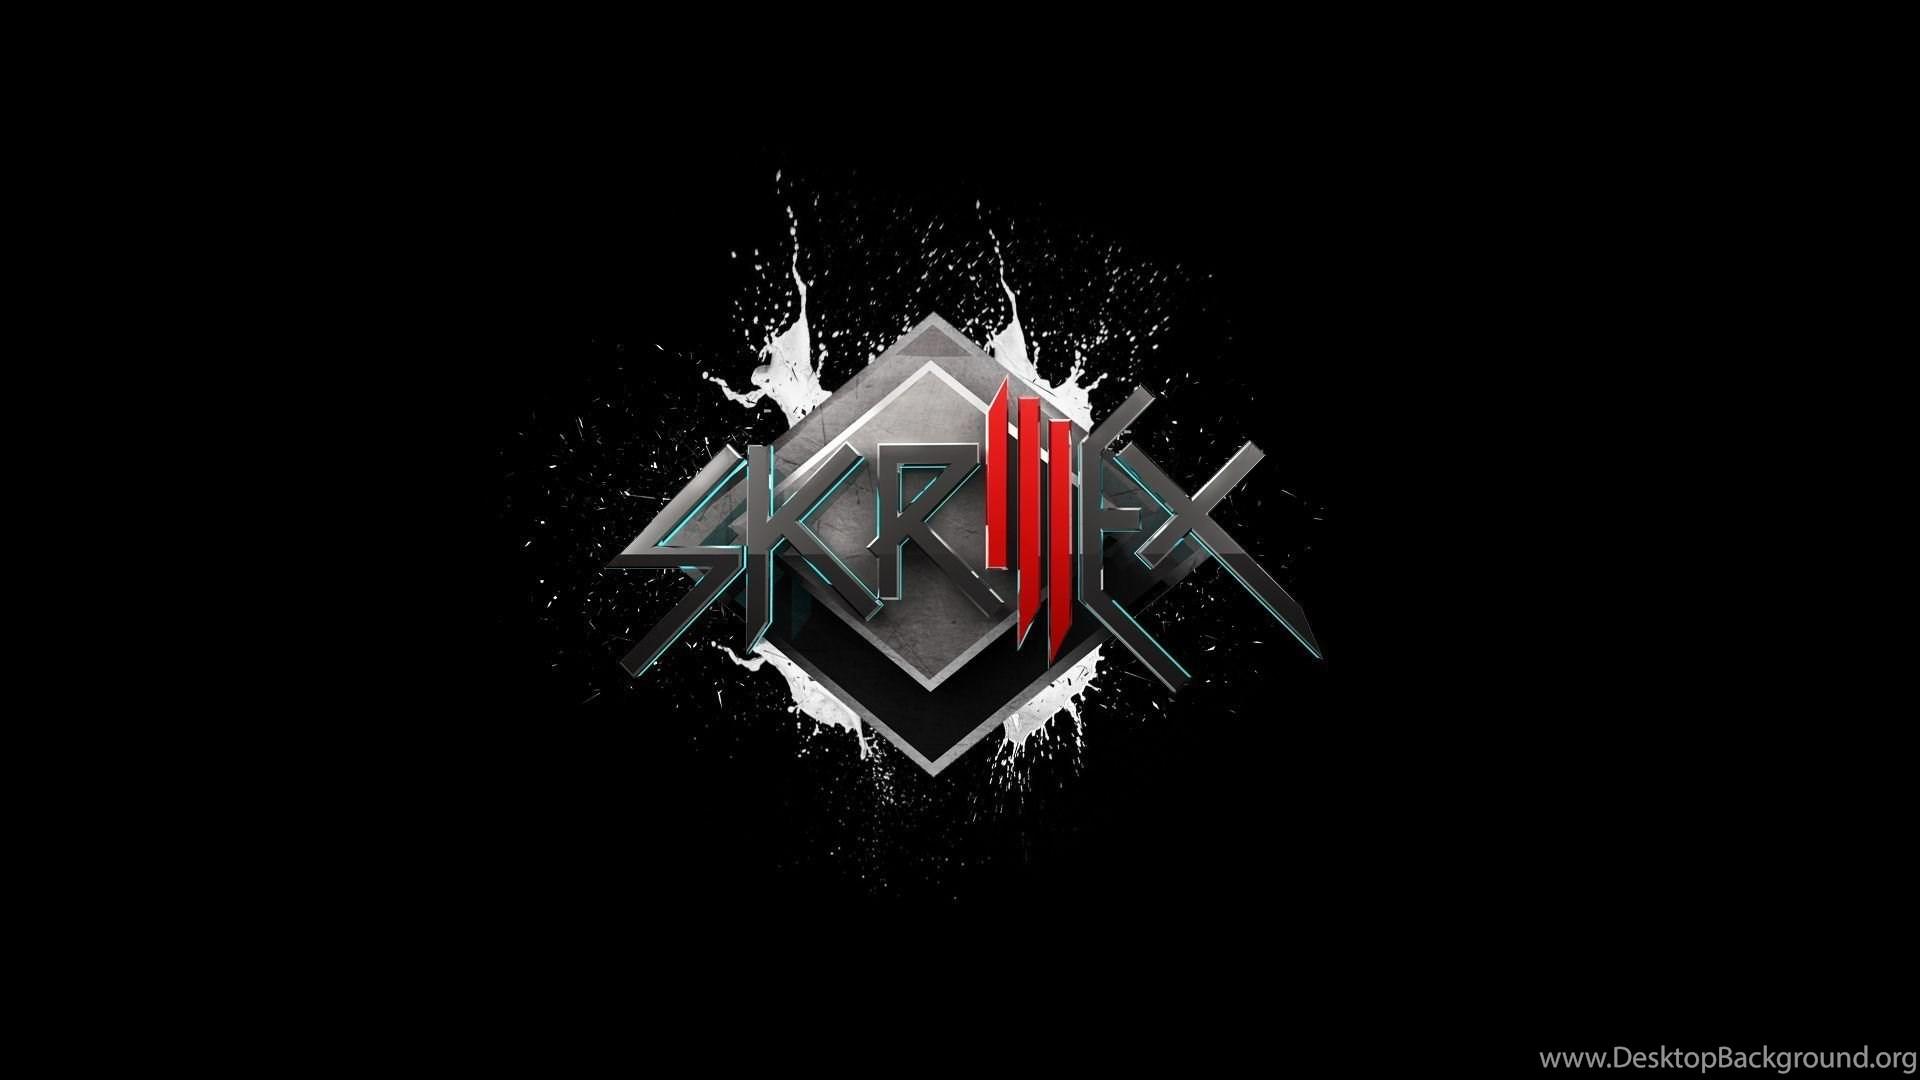 Skrillex Wallpapers 1080p Desktop Background